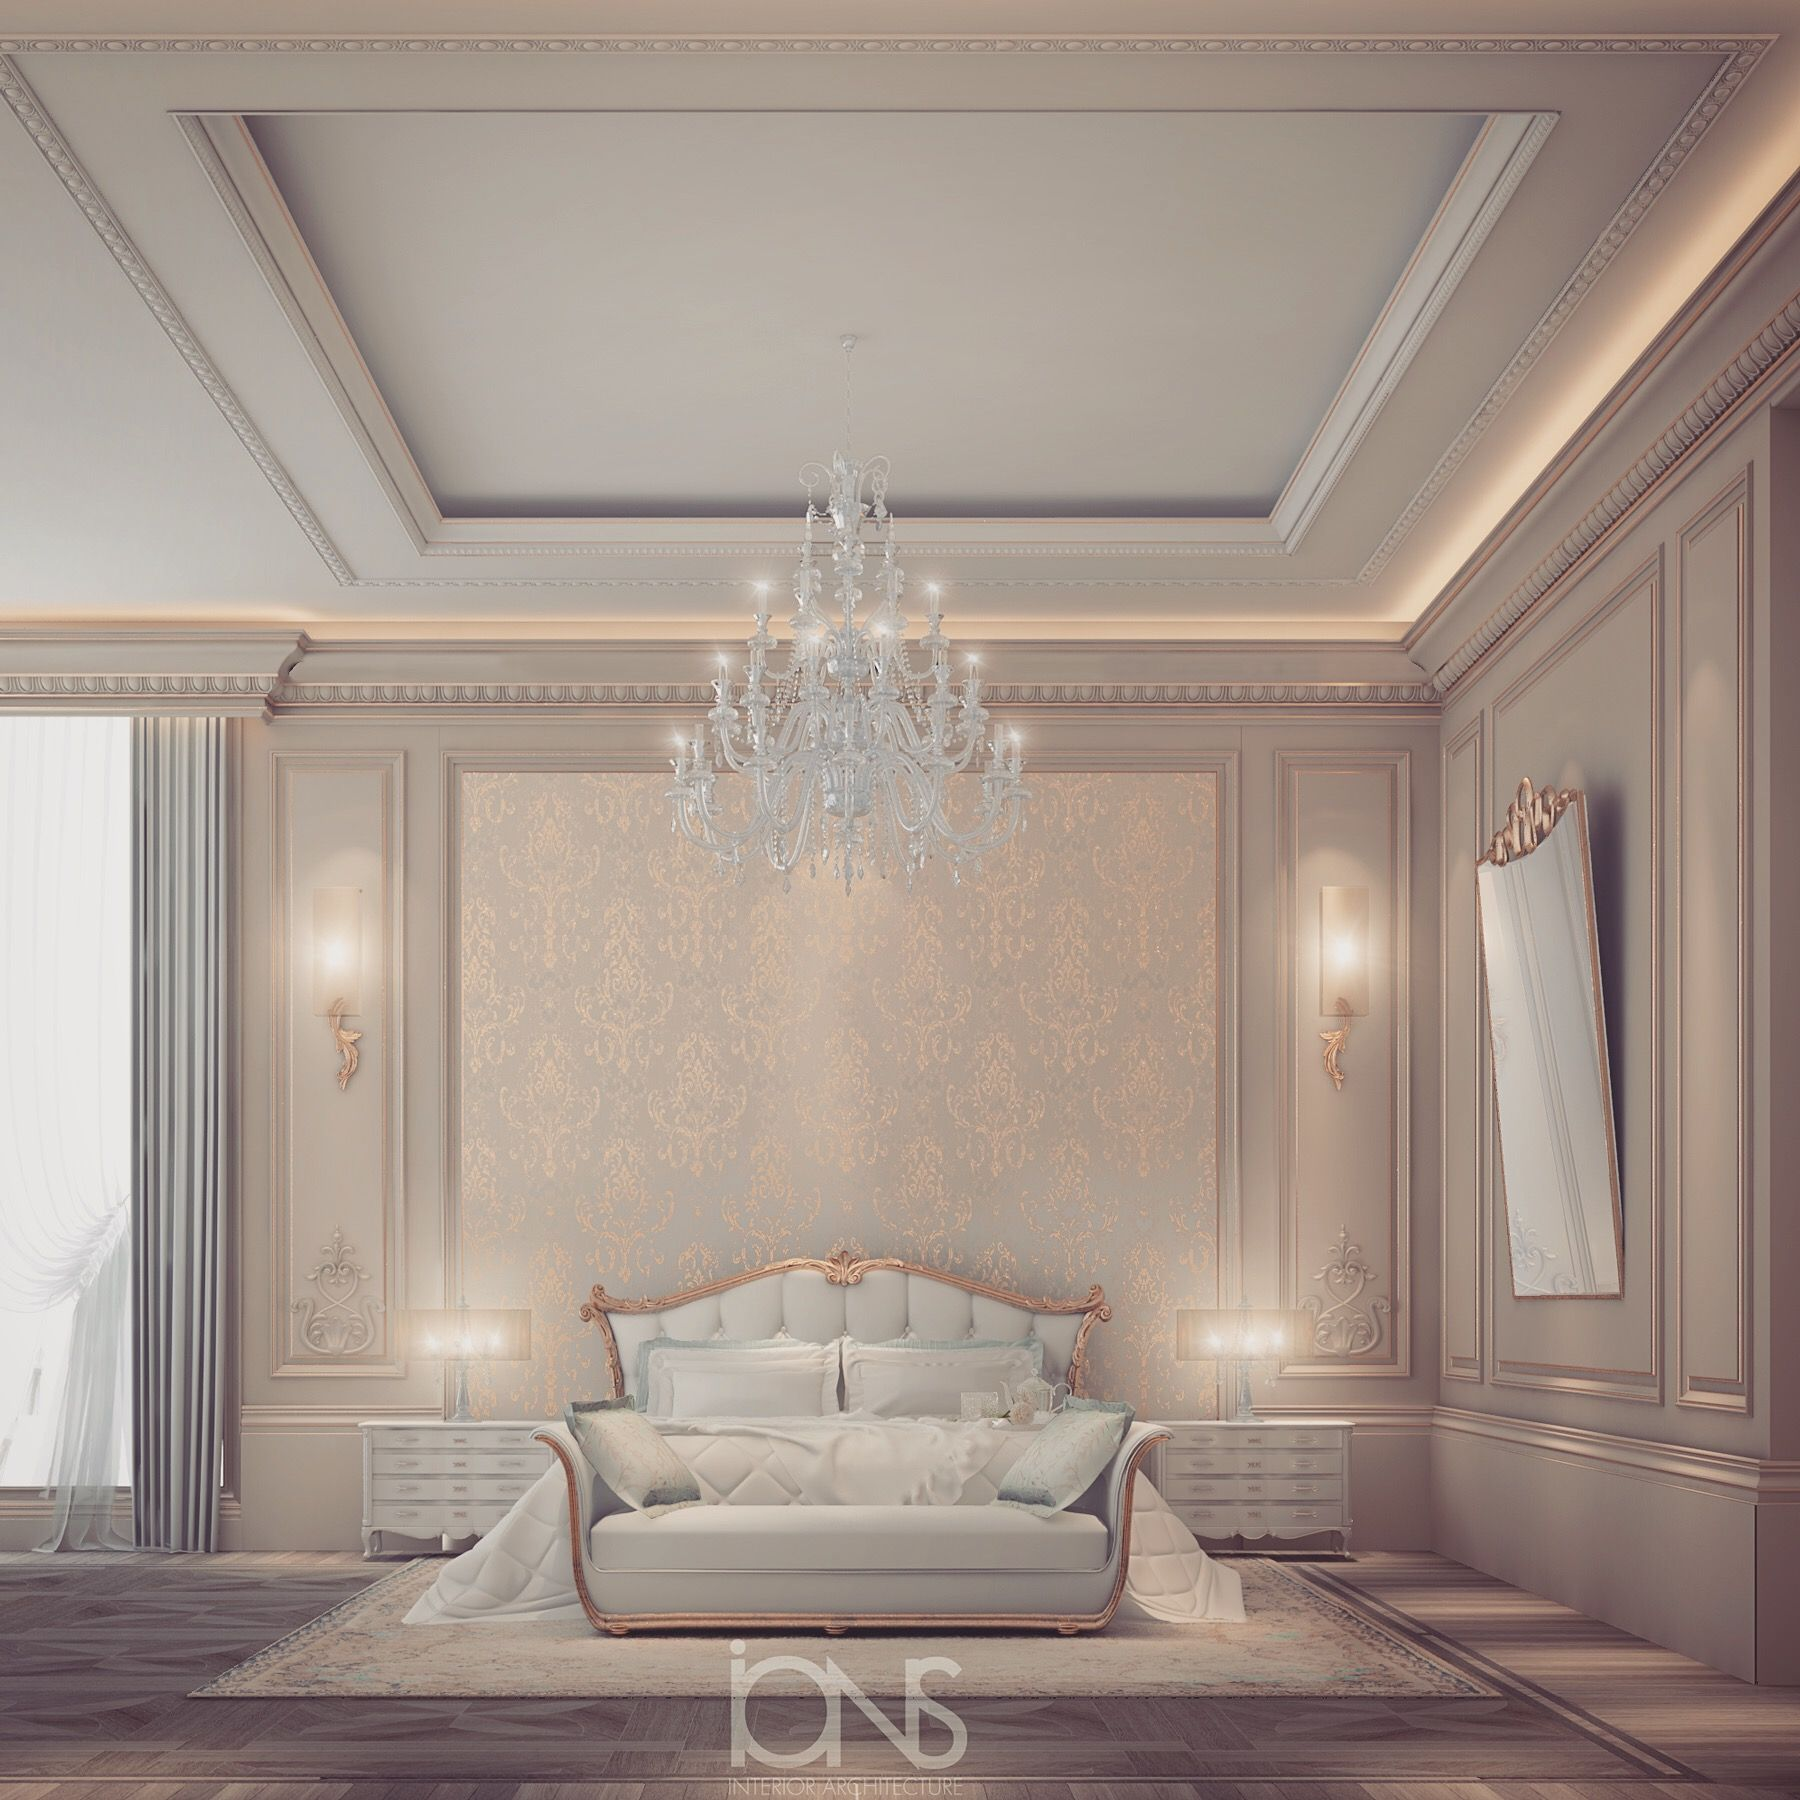 Bedroom design Qatar private palace Bedroom design